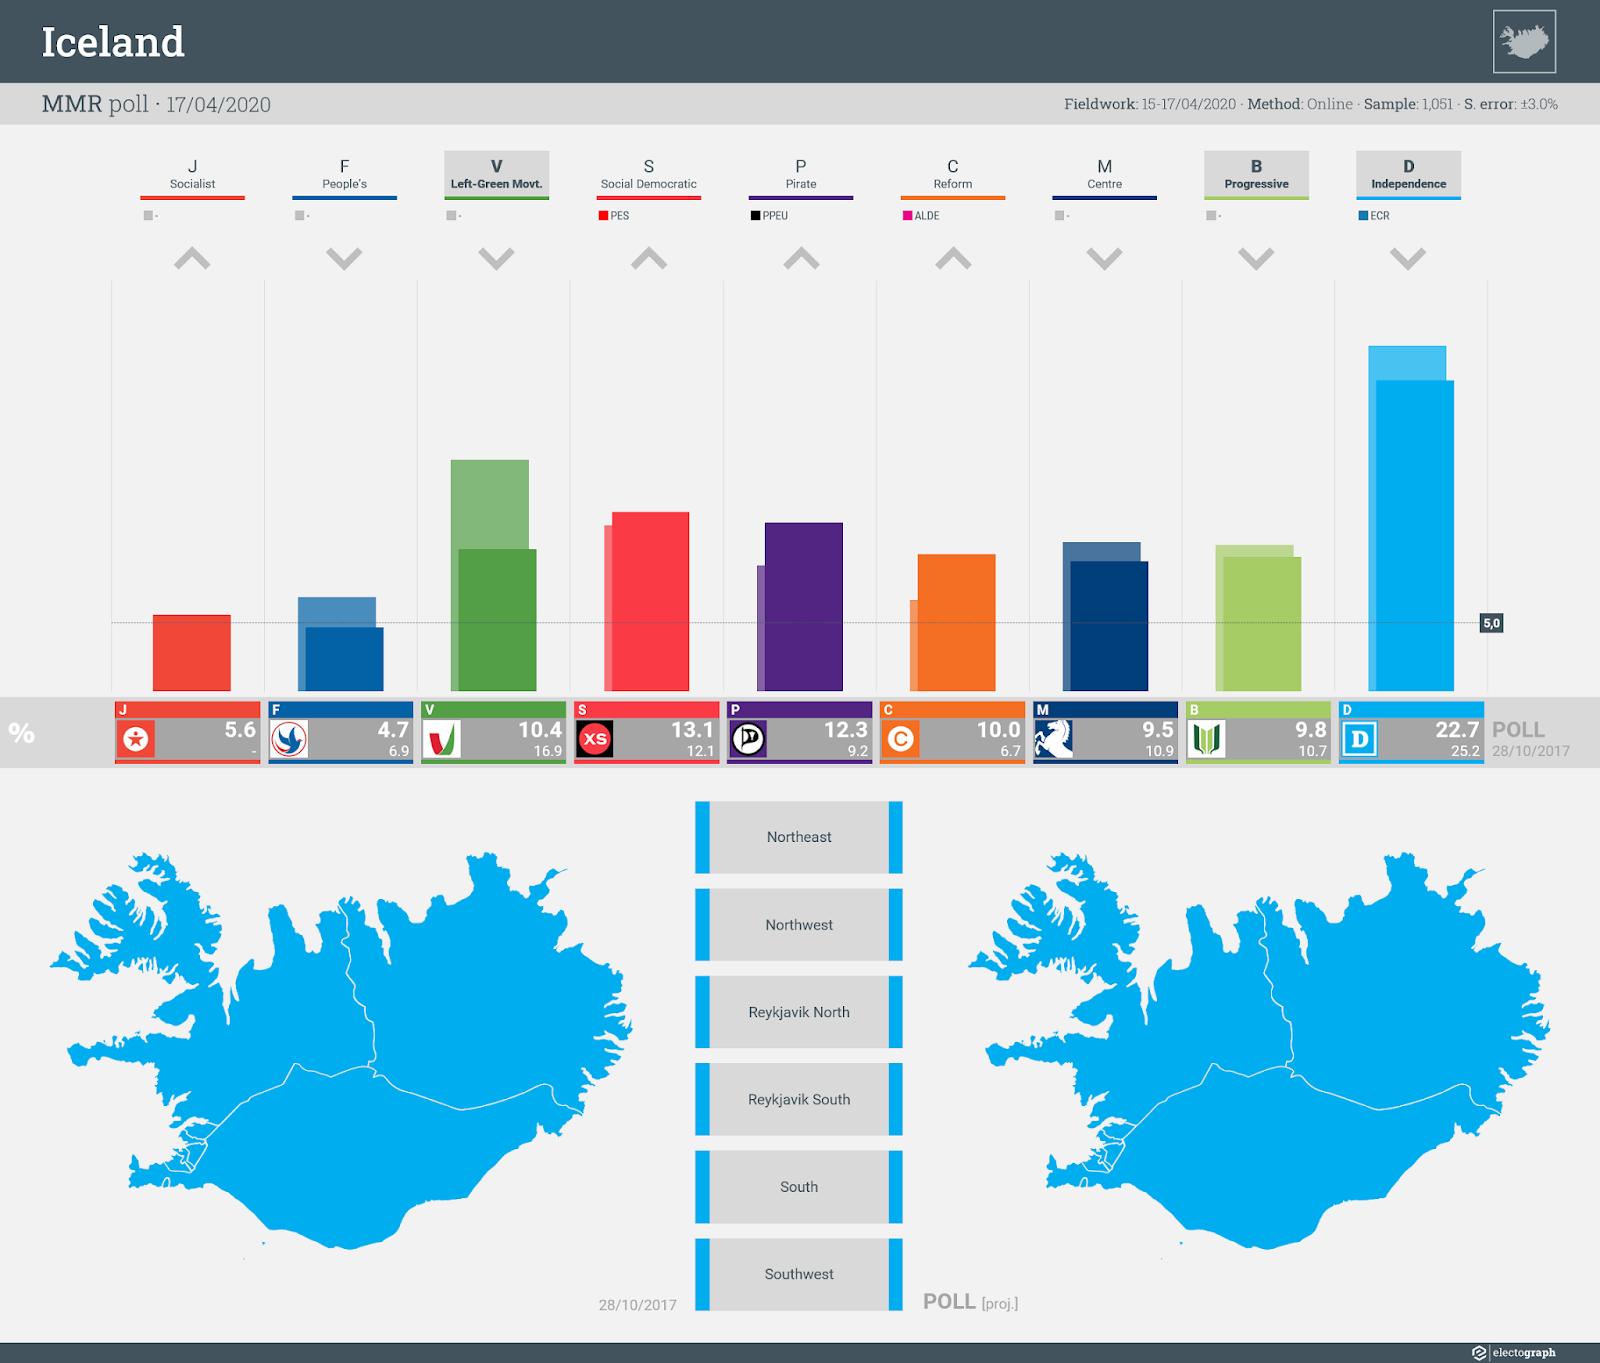 ICELAND: MMR poll chart, 17 April 2020